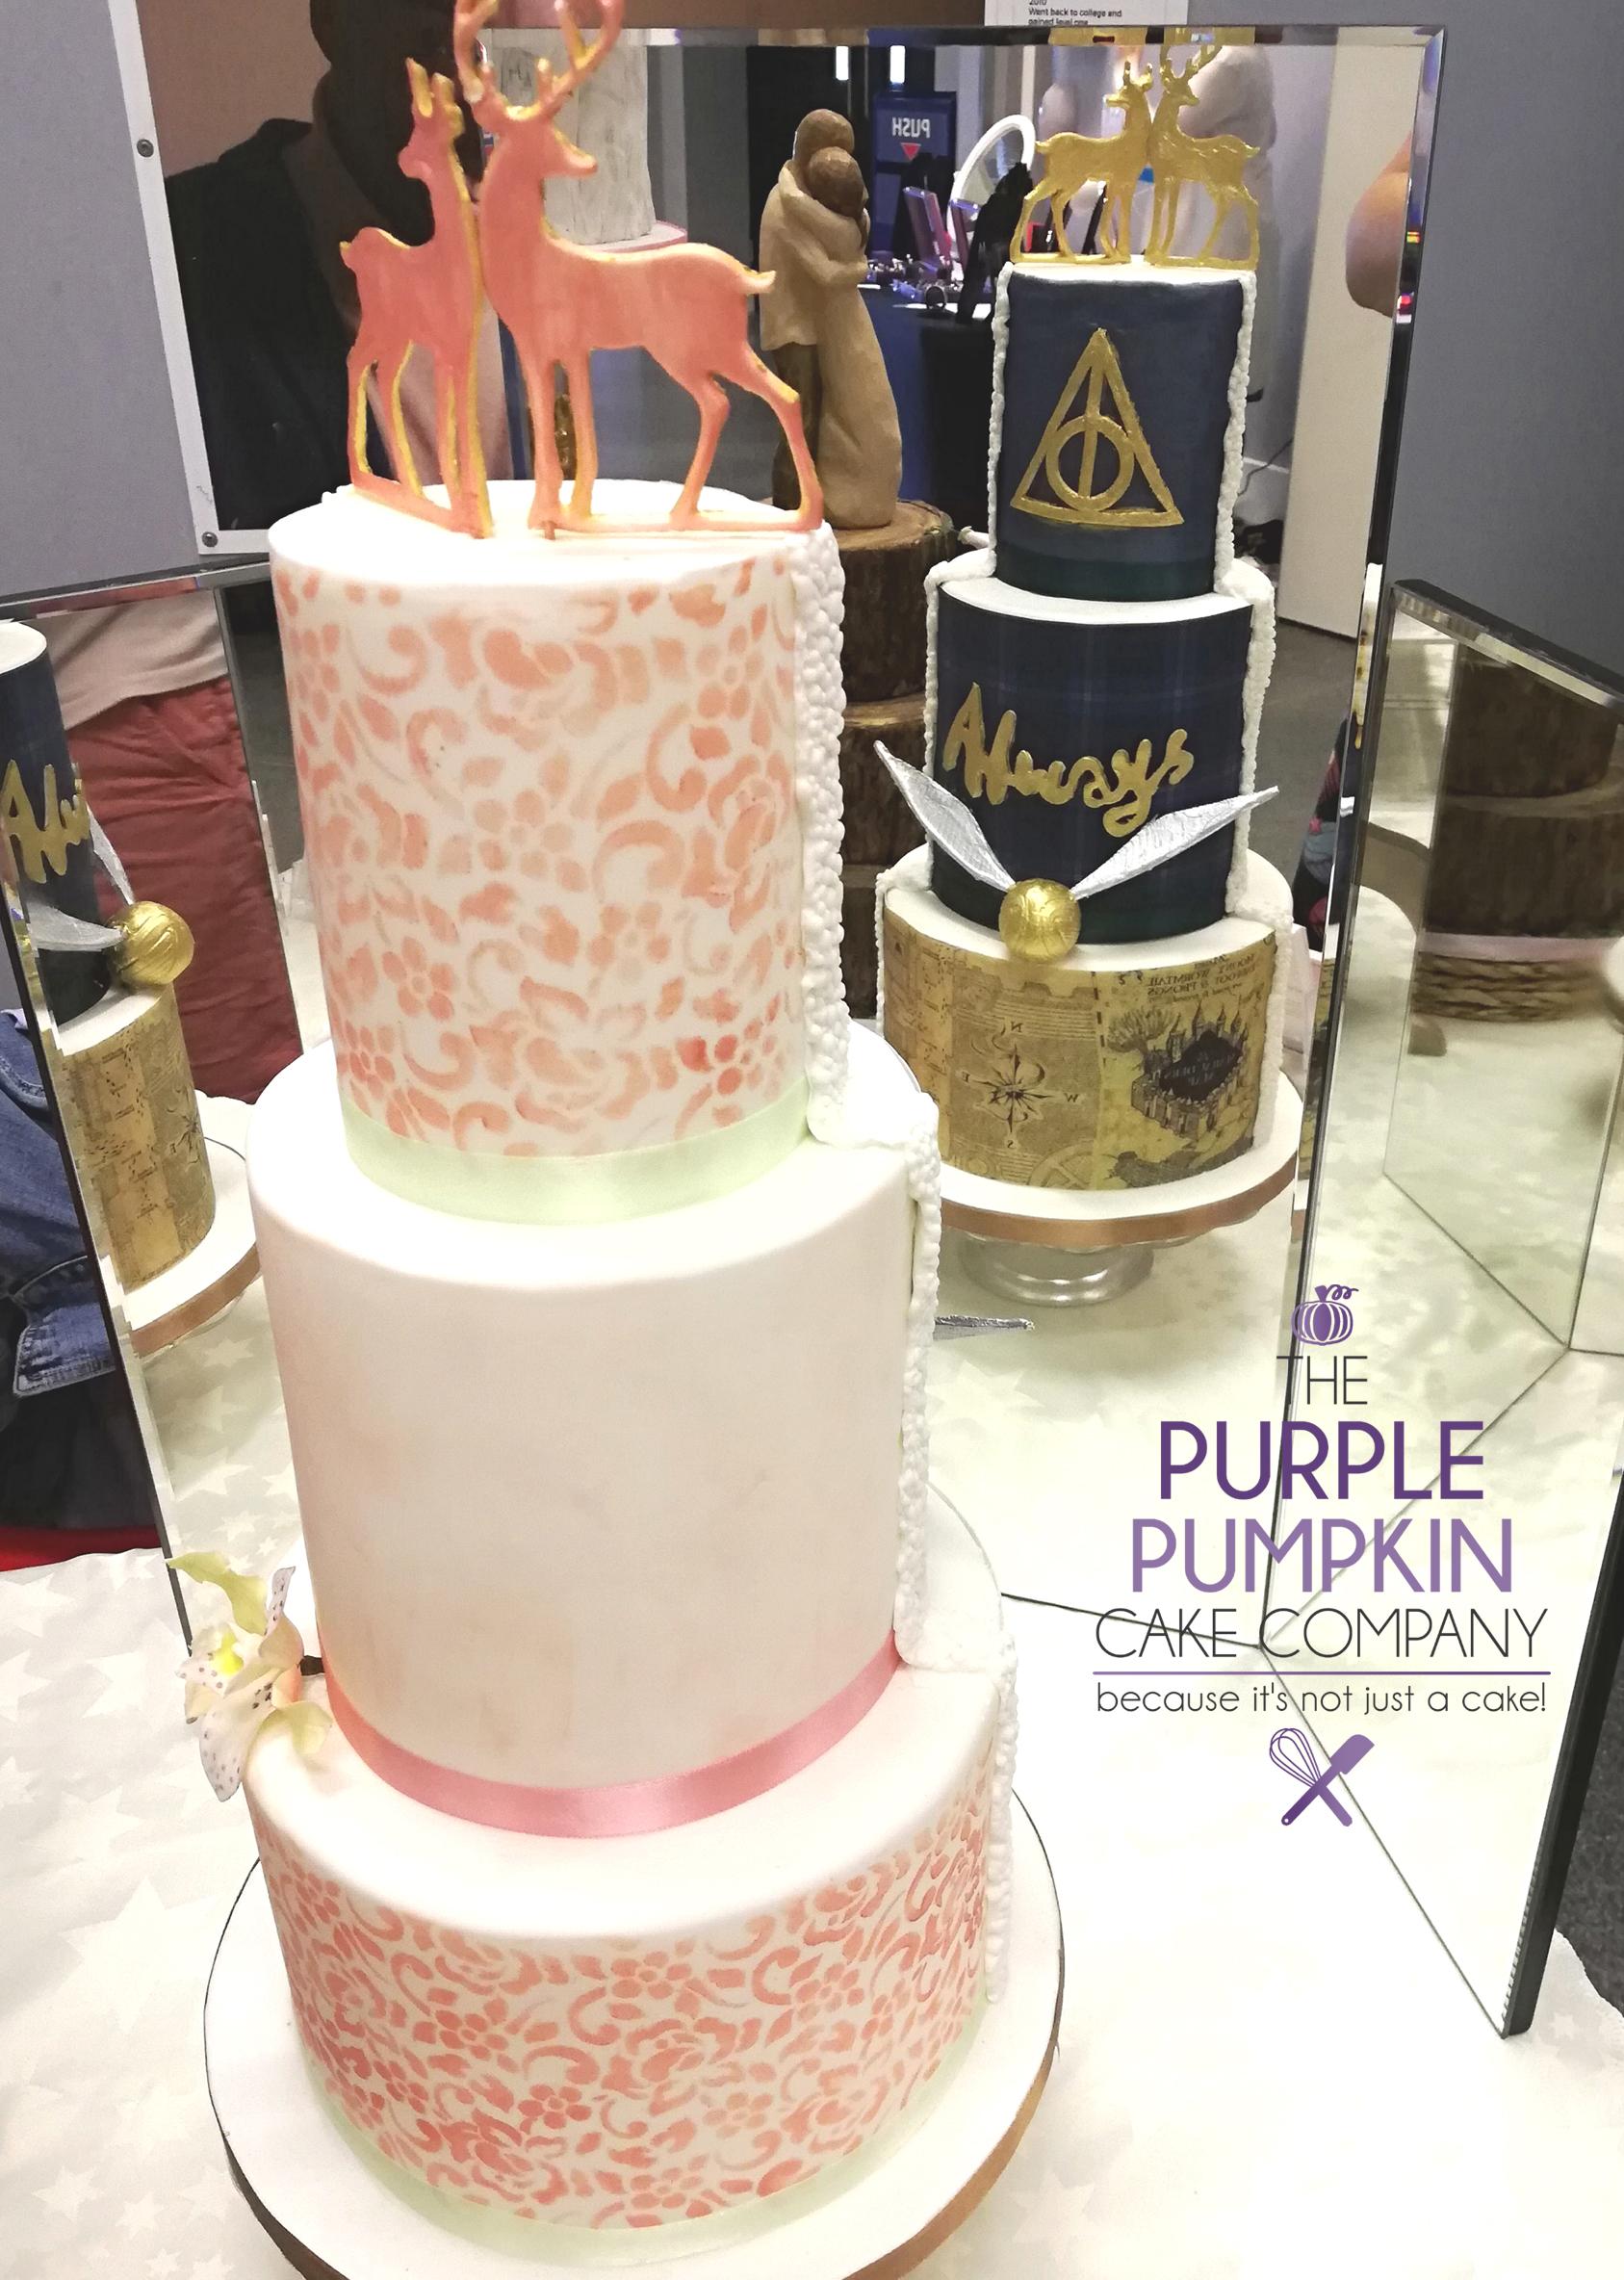 Harry Potter Wedding Cake.Wedding Cakes Stamford The Purple Pumpkin Cake Co